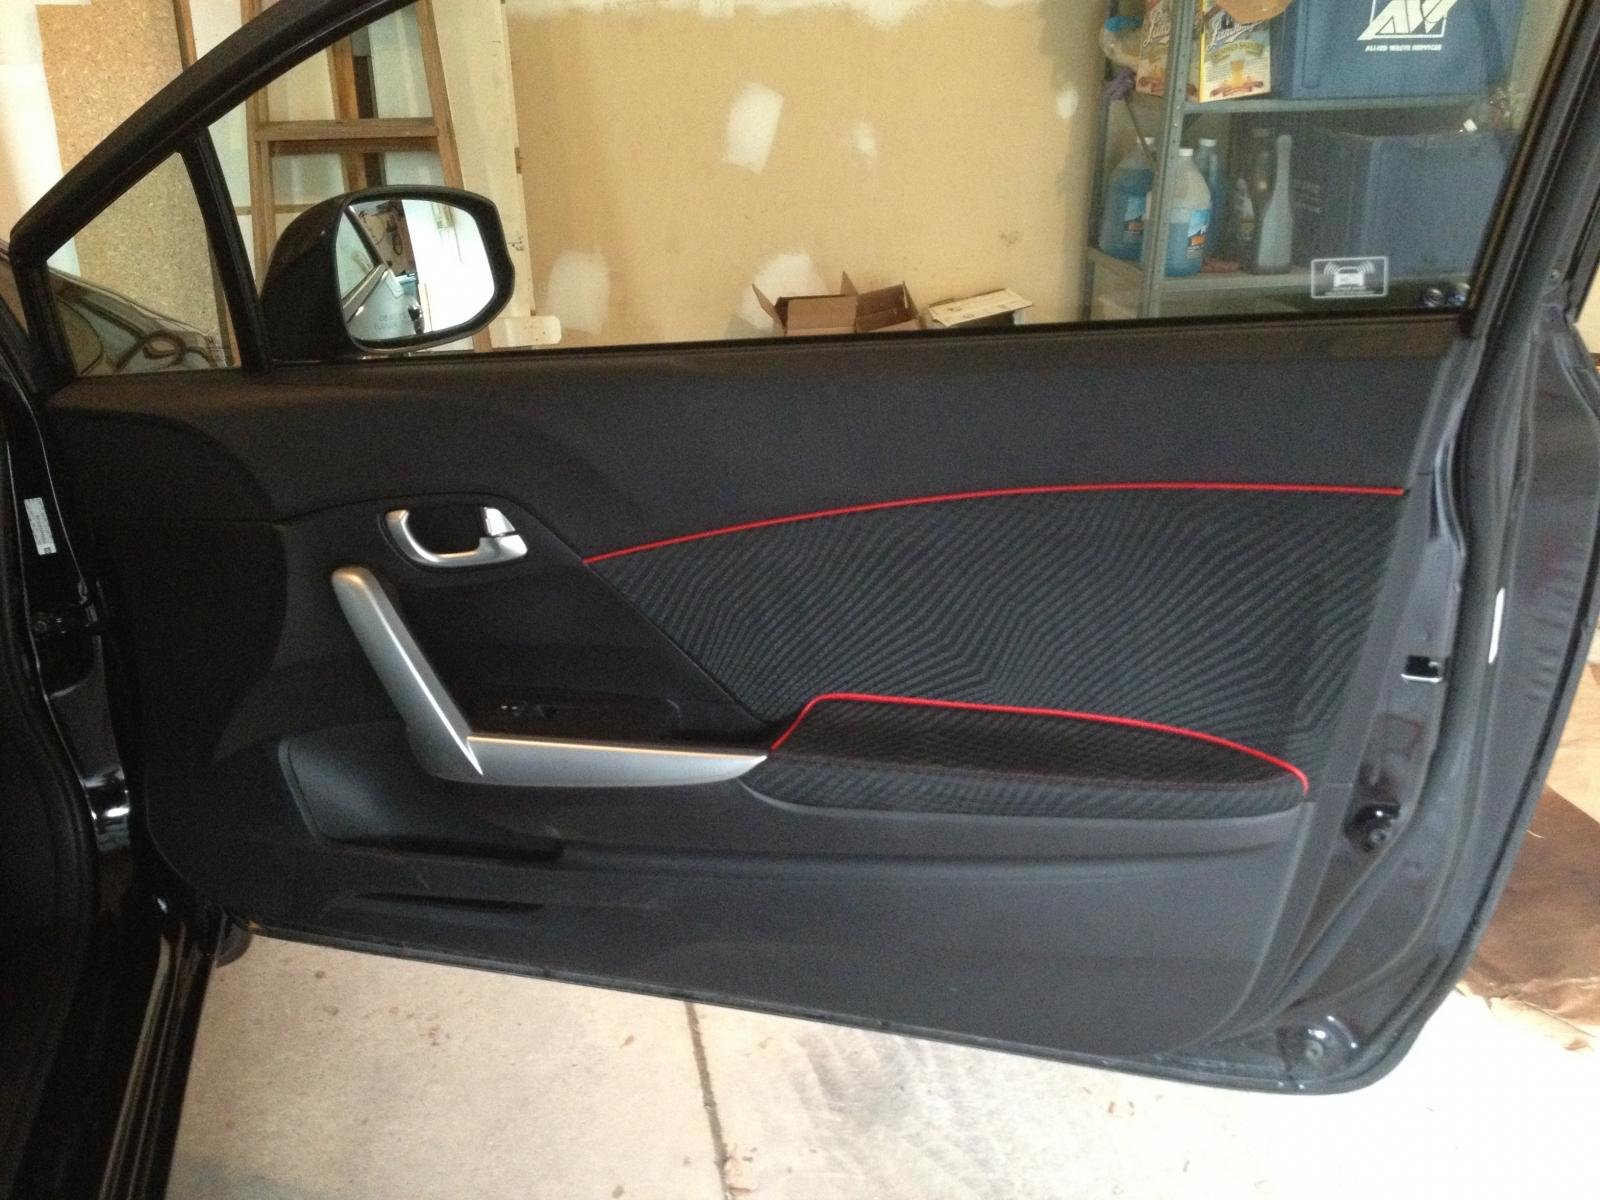 Car interior piping - Interior Door Piping Welt Trimming Img_0466 Jpg